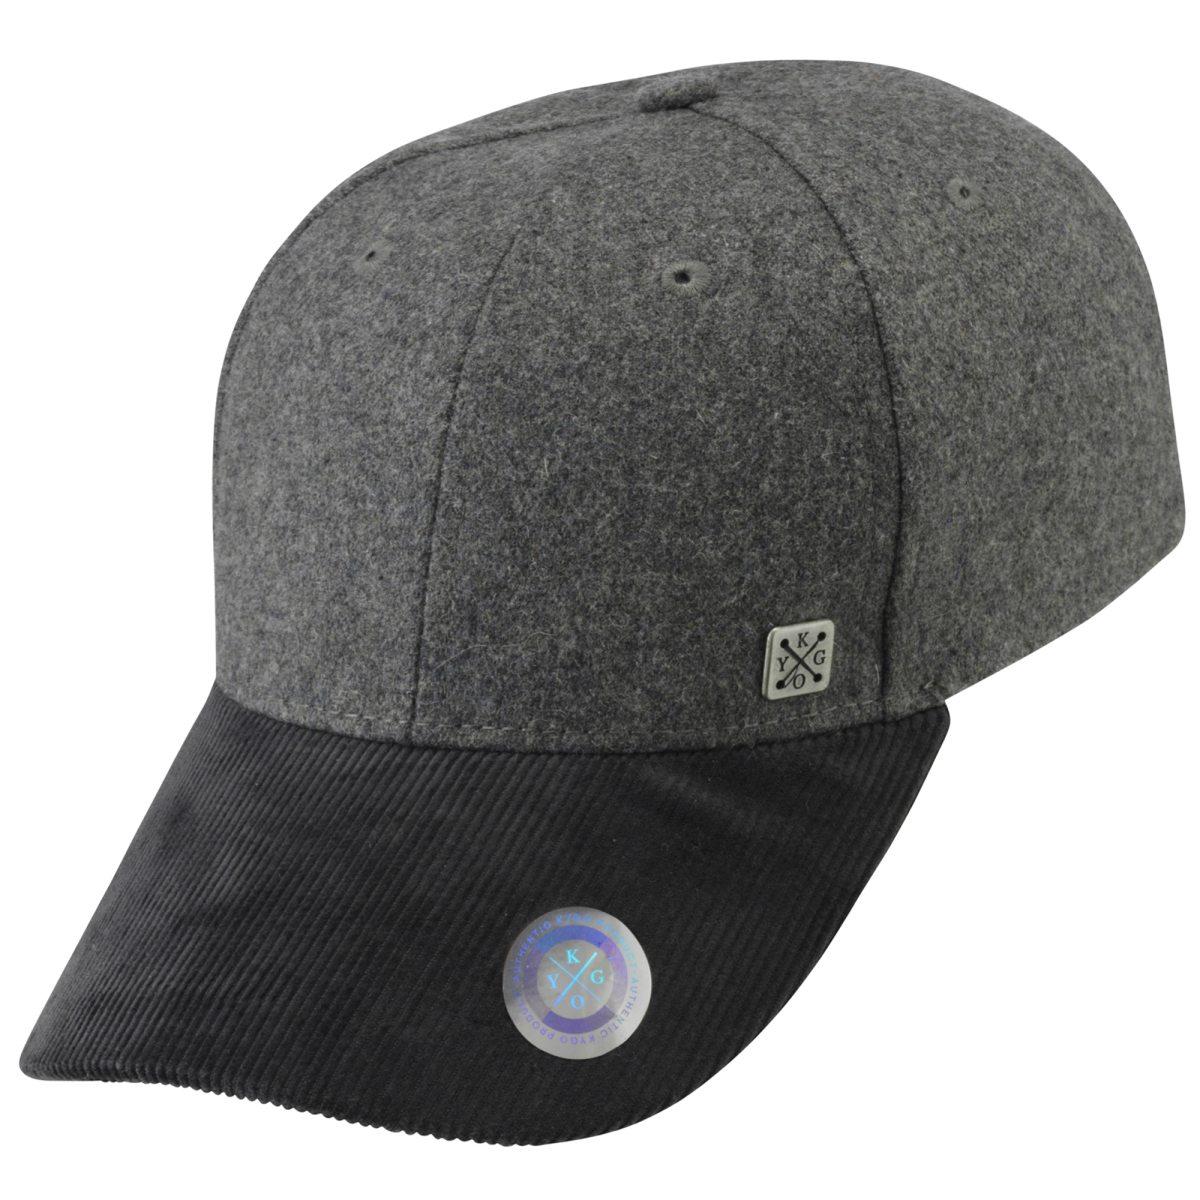 a1bb1d0a206db logo wool cap finns på PricePi.com.